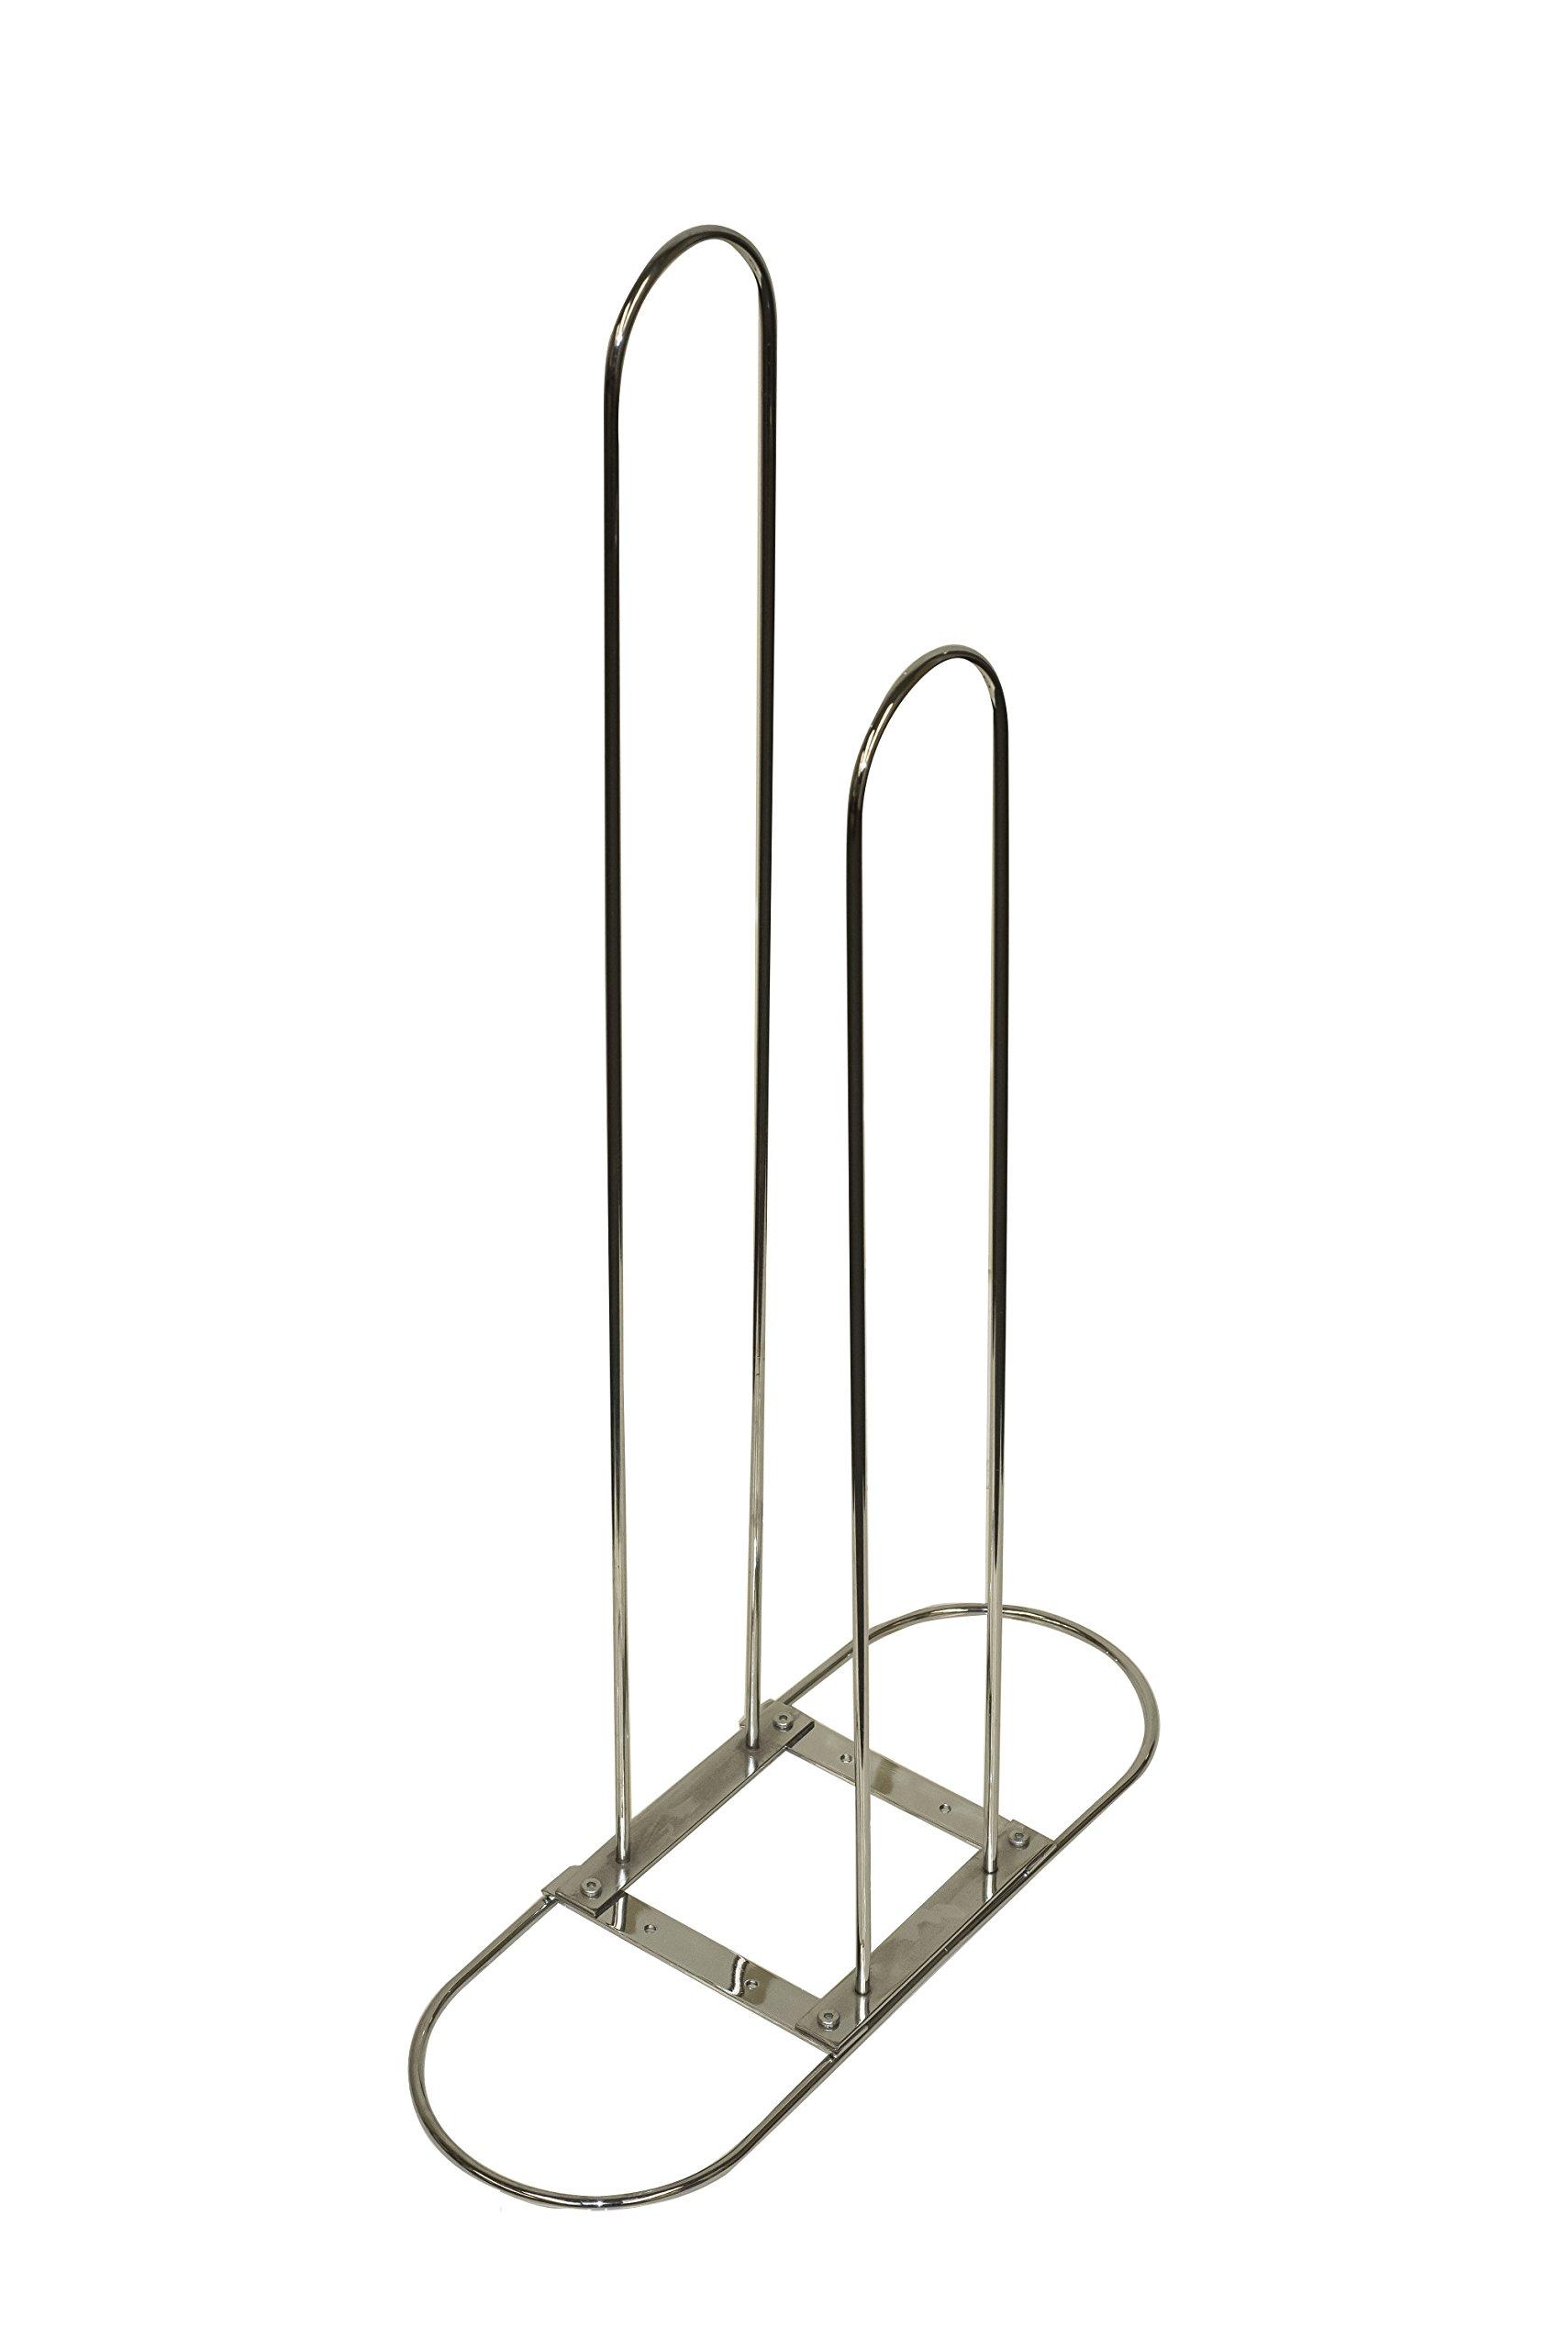 Hanger Stacker Screw Together Assembly (1-(Pack))